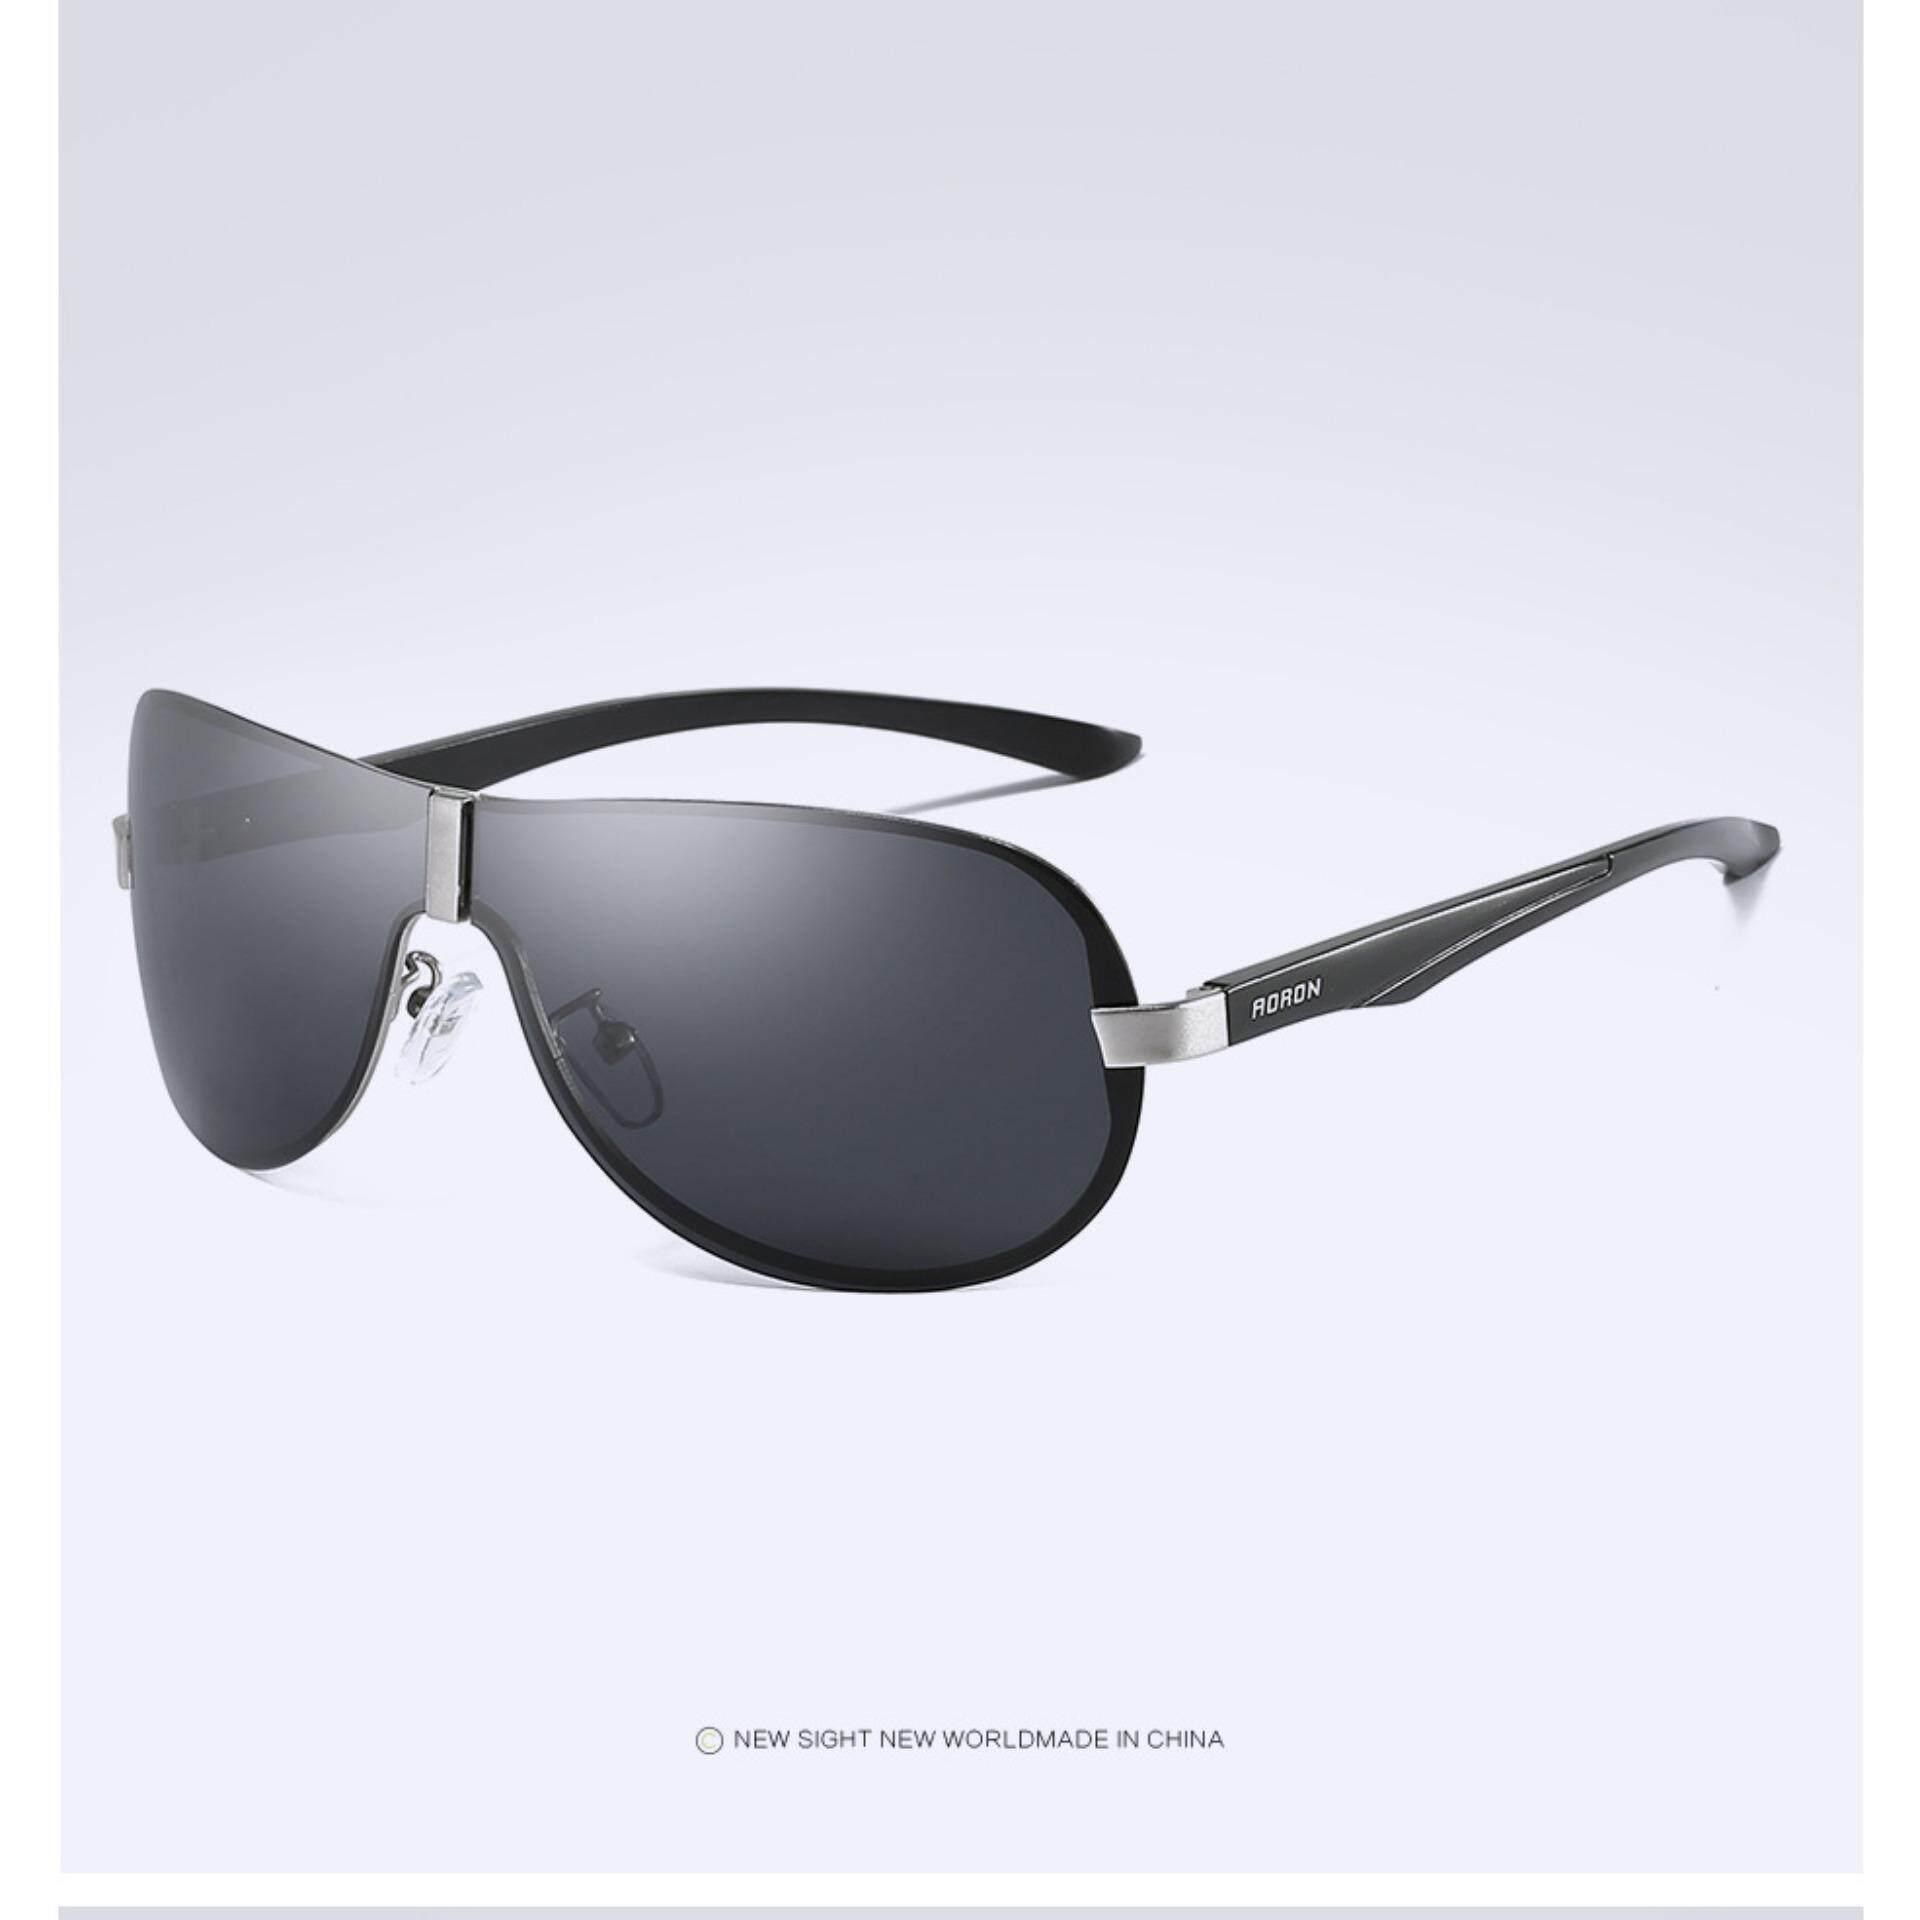 Hdcrafter Merek Kacamata untuk Pria 2017 Desain Terpolarisasi Mengemudi  Berjemur Kacamata untuk Pria Keren Kacamata Oculos d949a47187